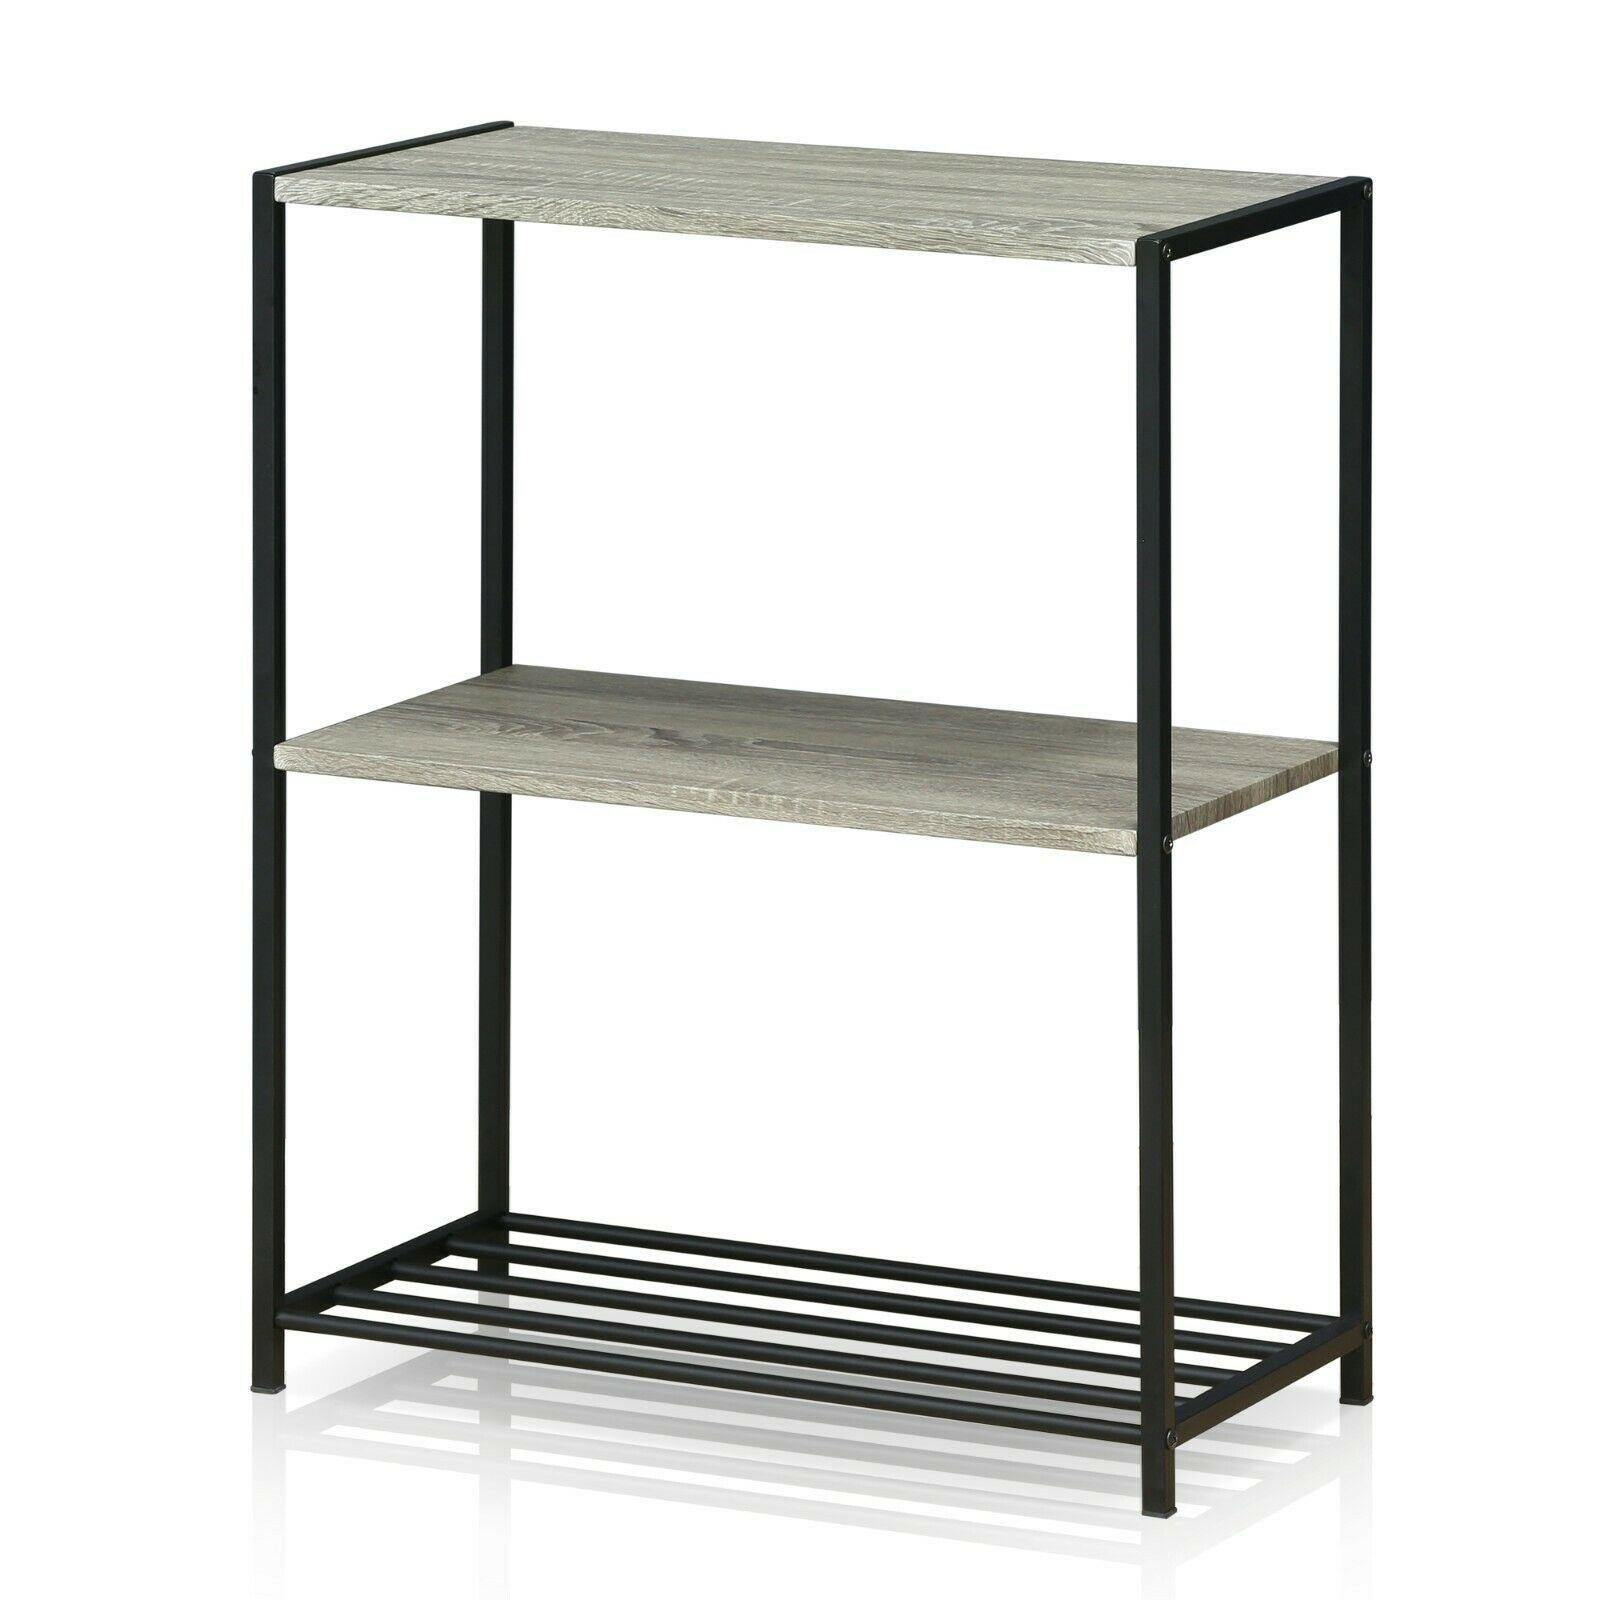 Furinno Basic 3-Tier Bookcase Storage Shelves, French Oak Grey